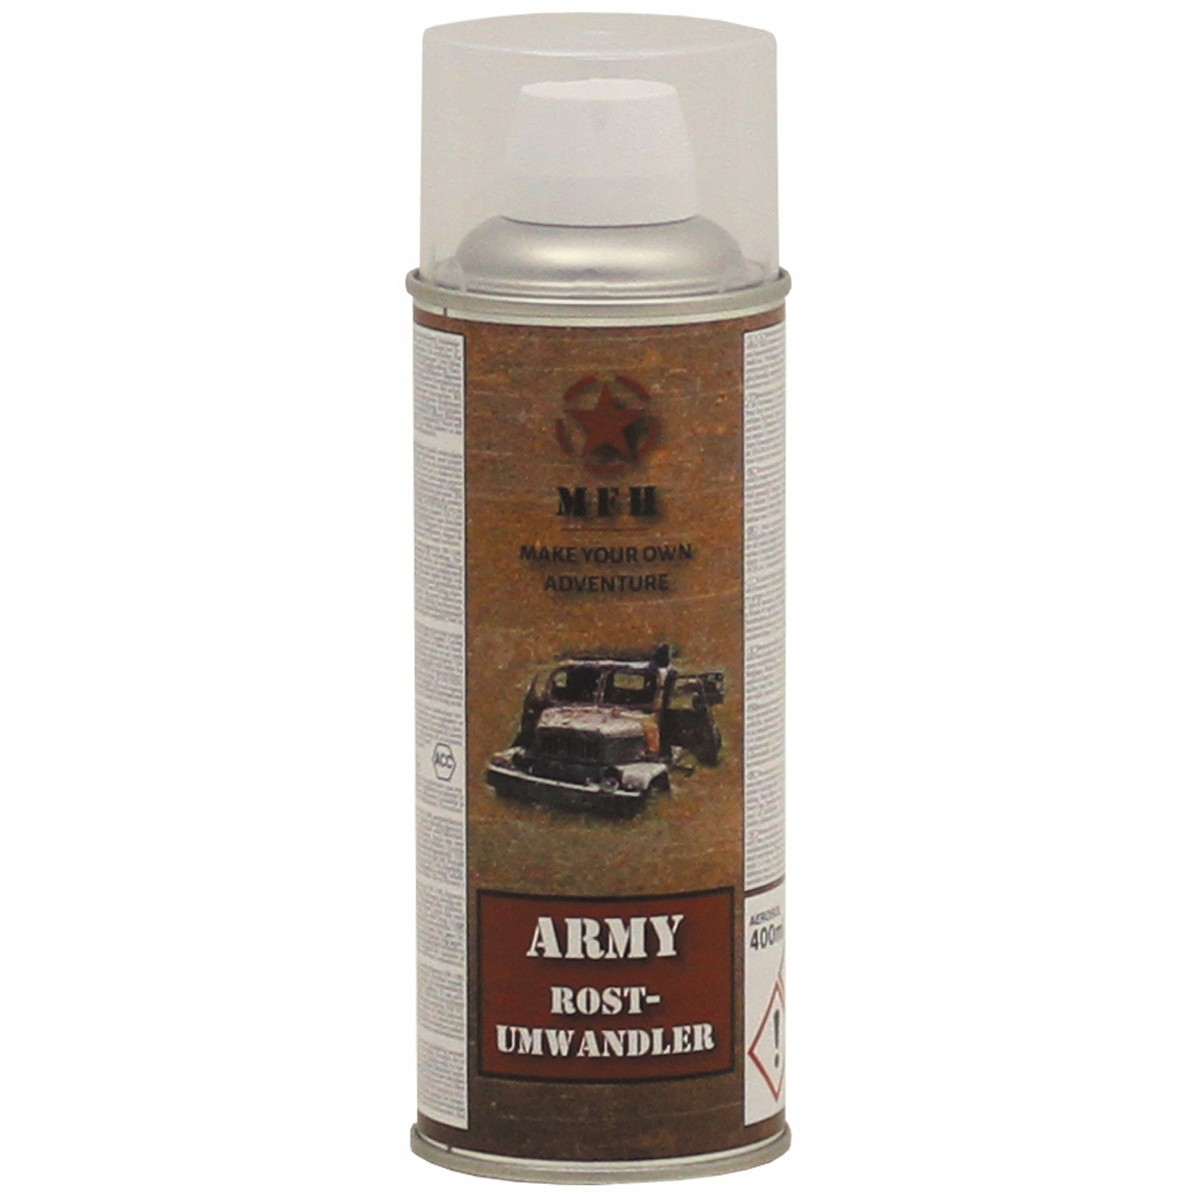 MFH Rostumwandlerspray Army 400ml